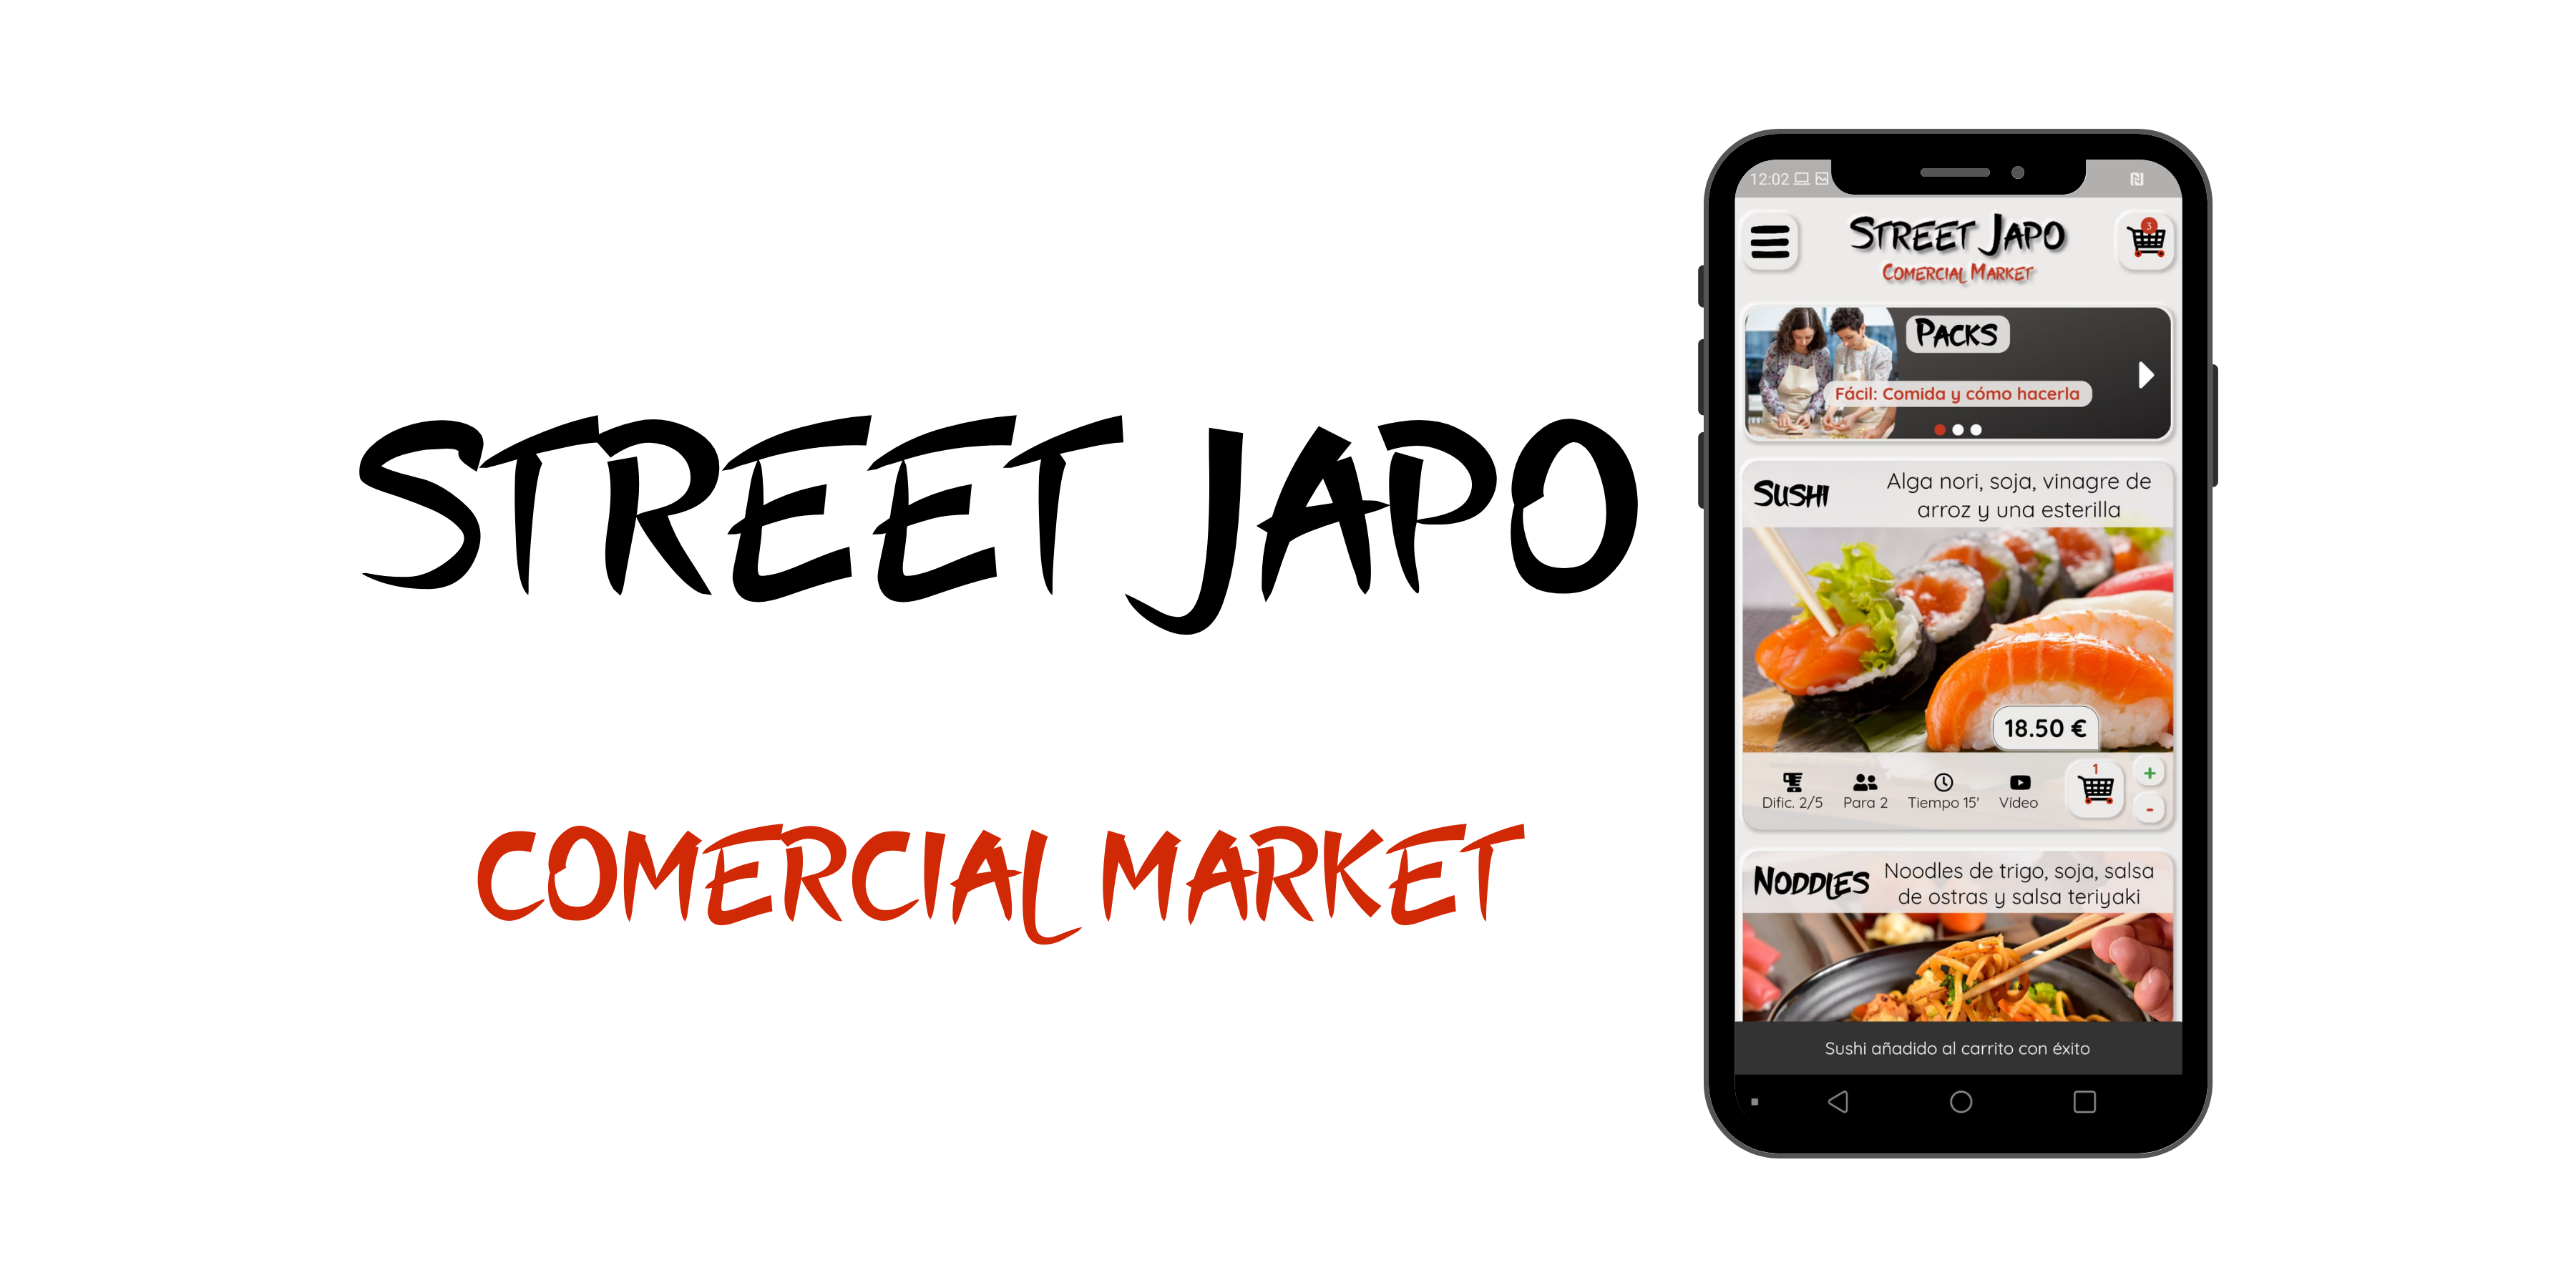 Street Japo